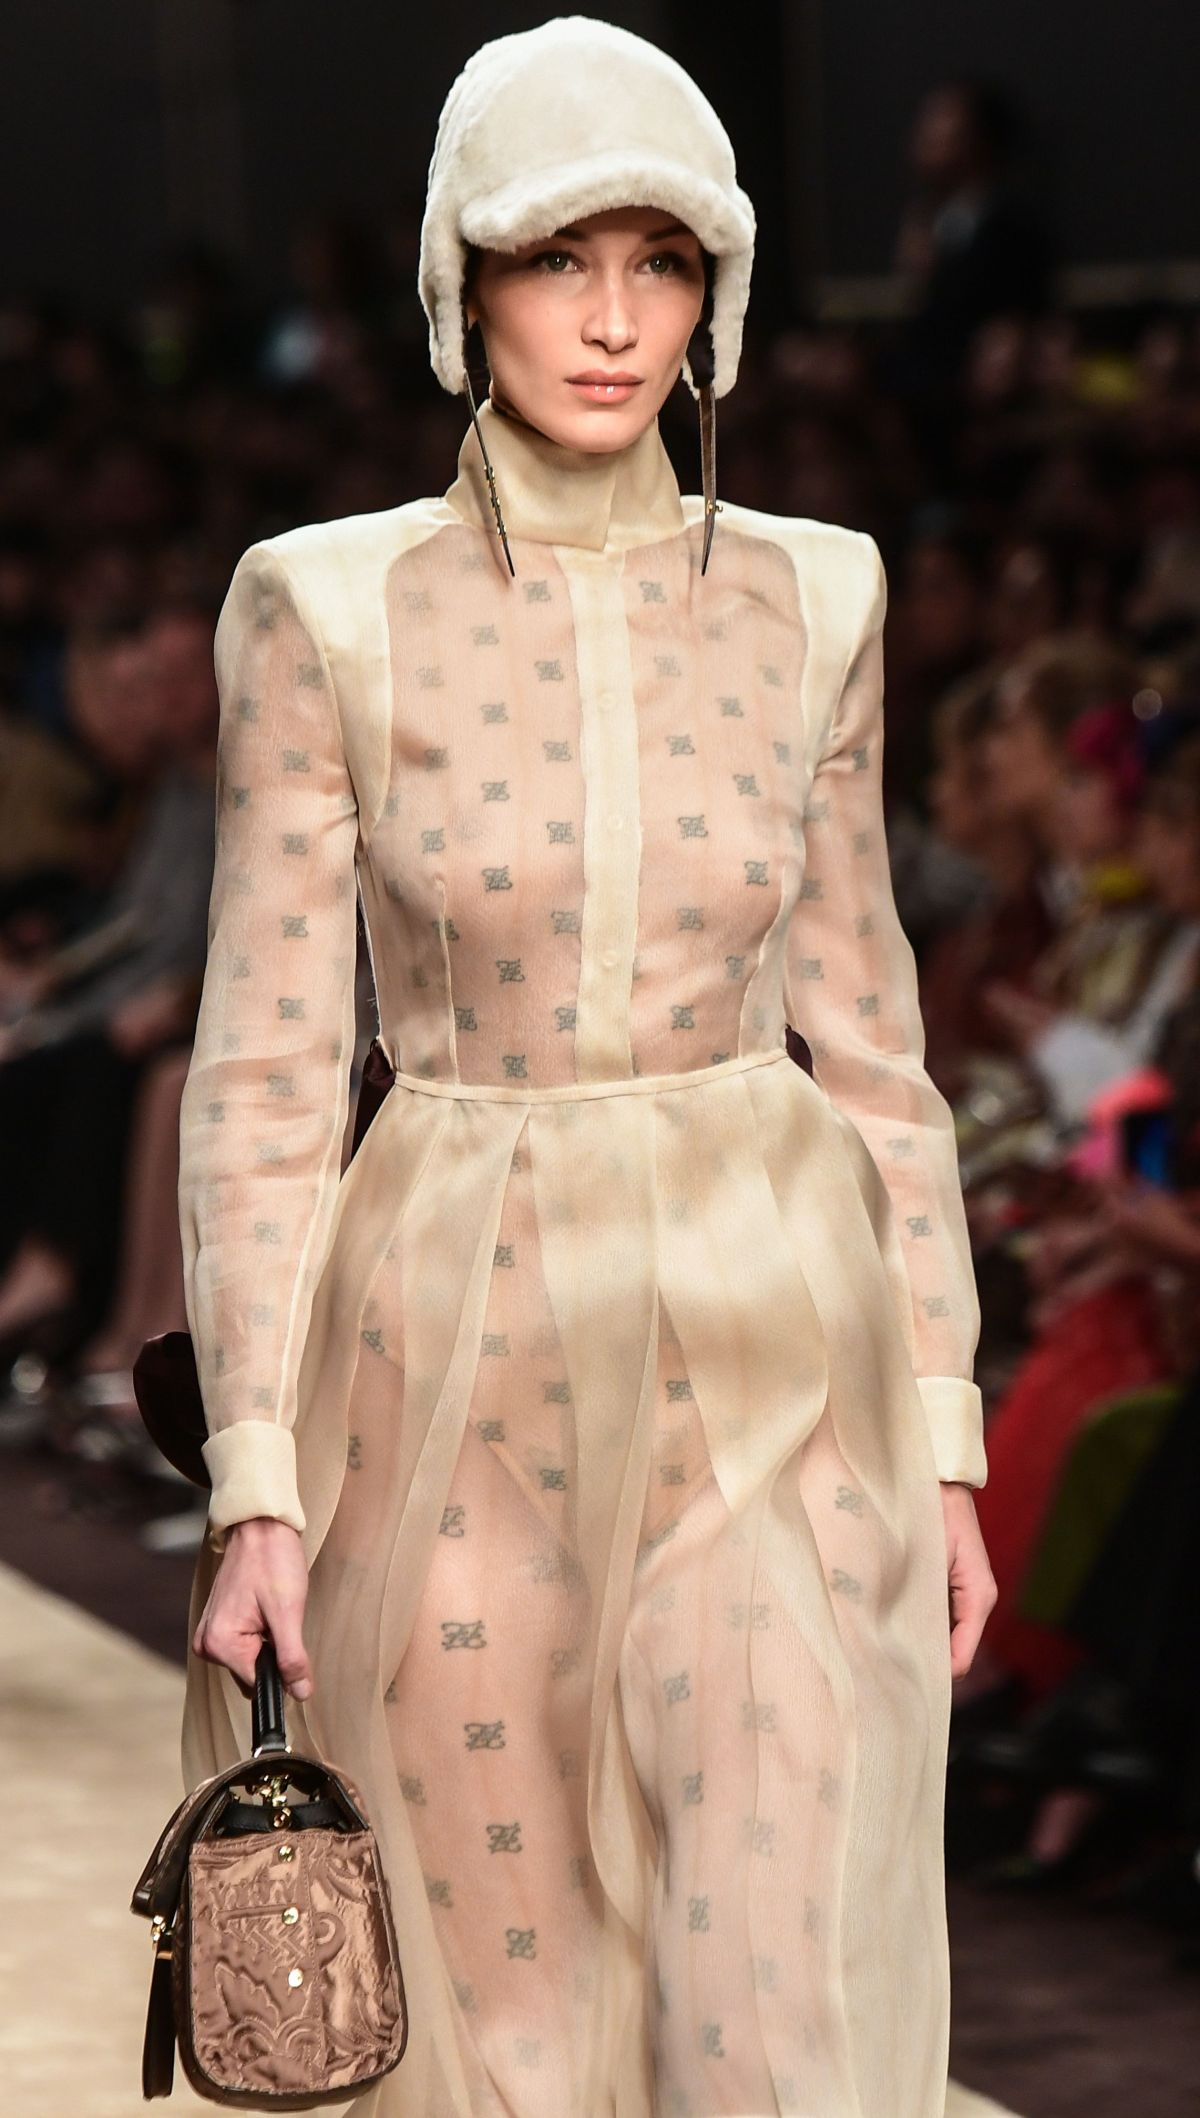 222efa33ea99 BELLA HADID at Fendi Runway Show at Milan Fashion Week 02 21 2019 ...